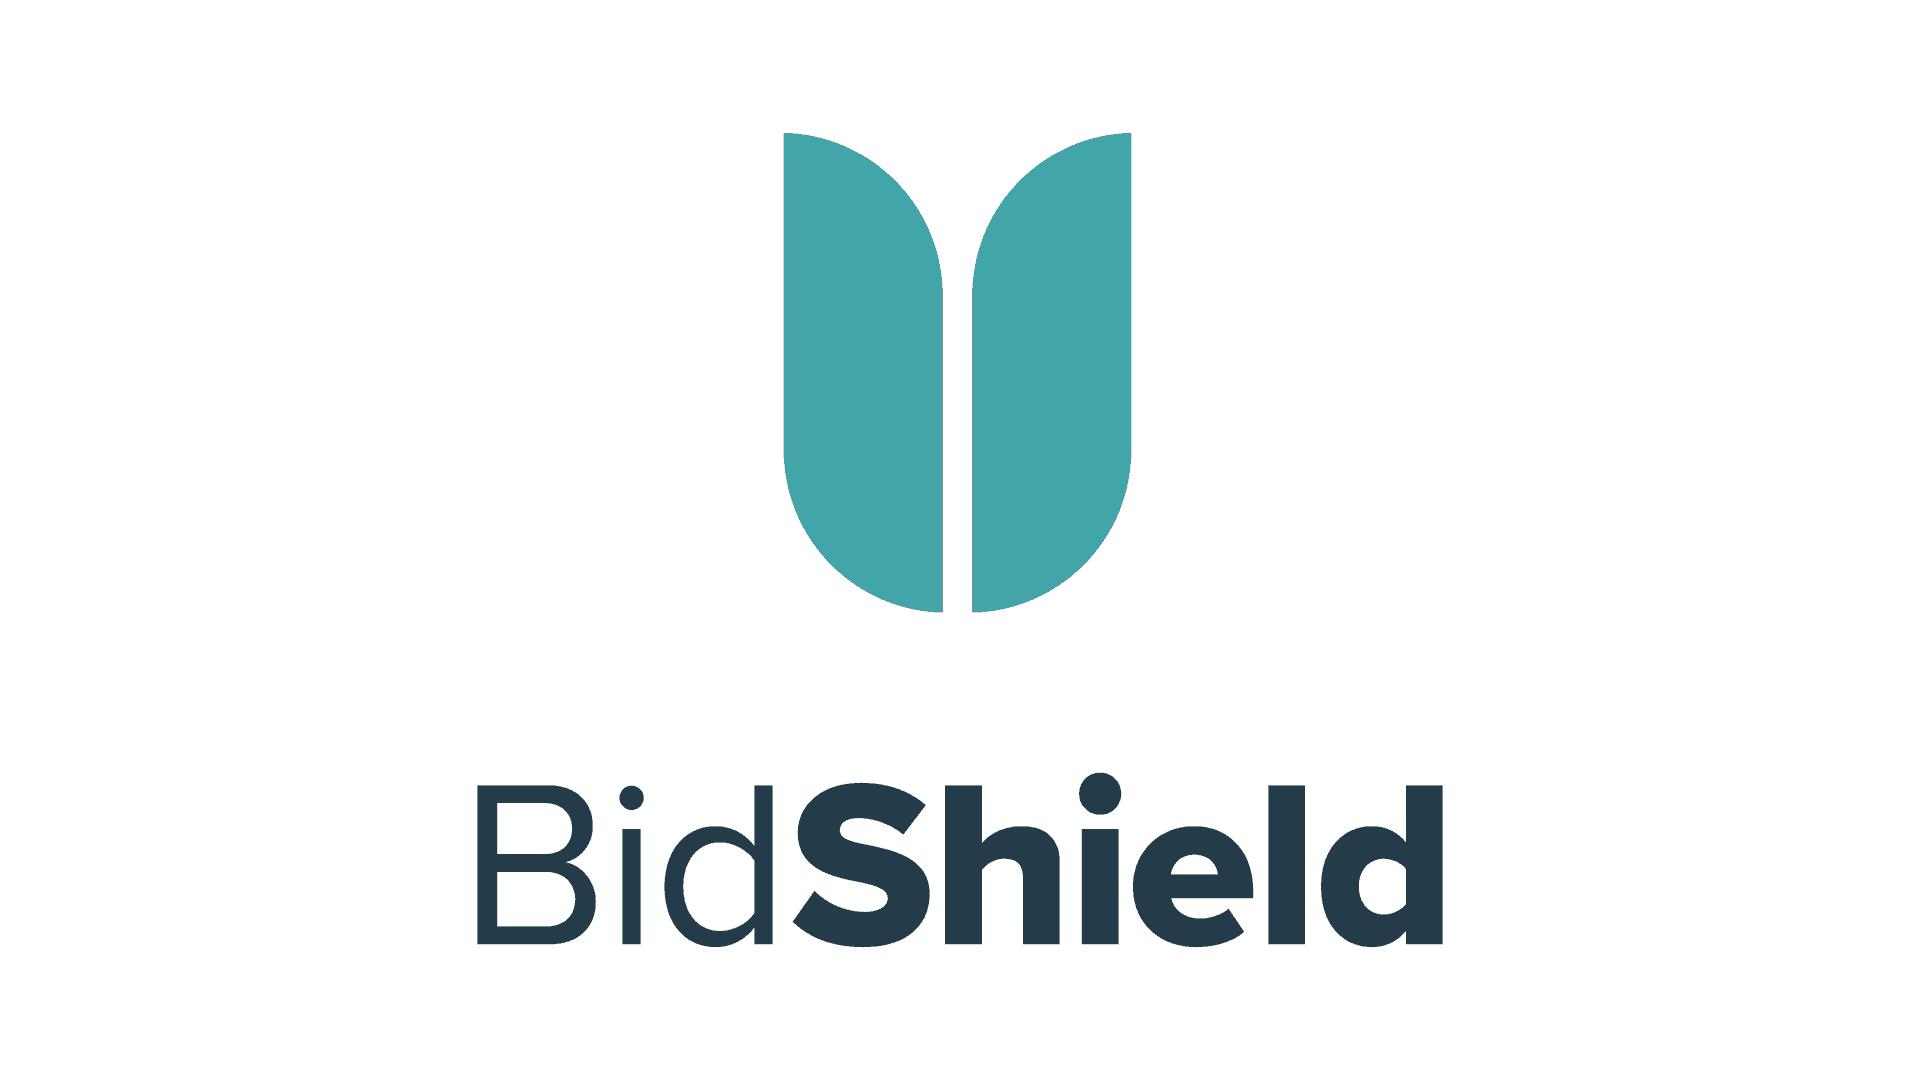 BidShield logo